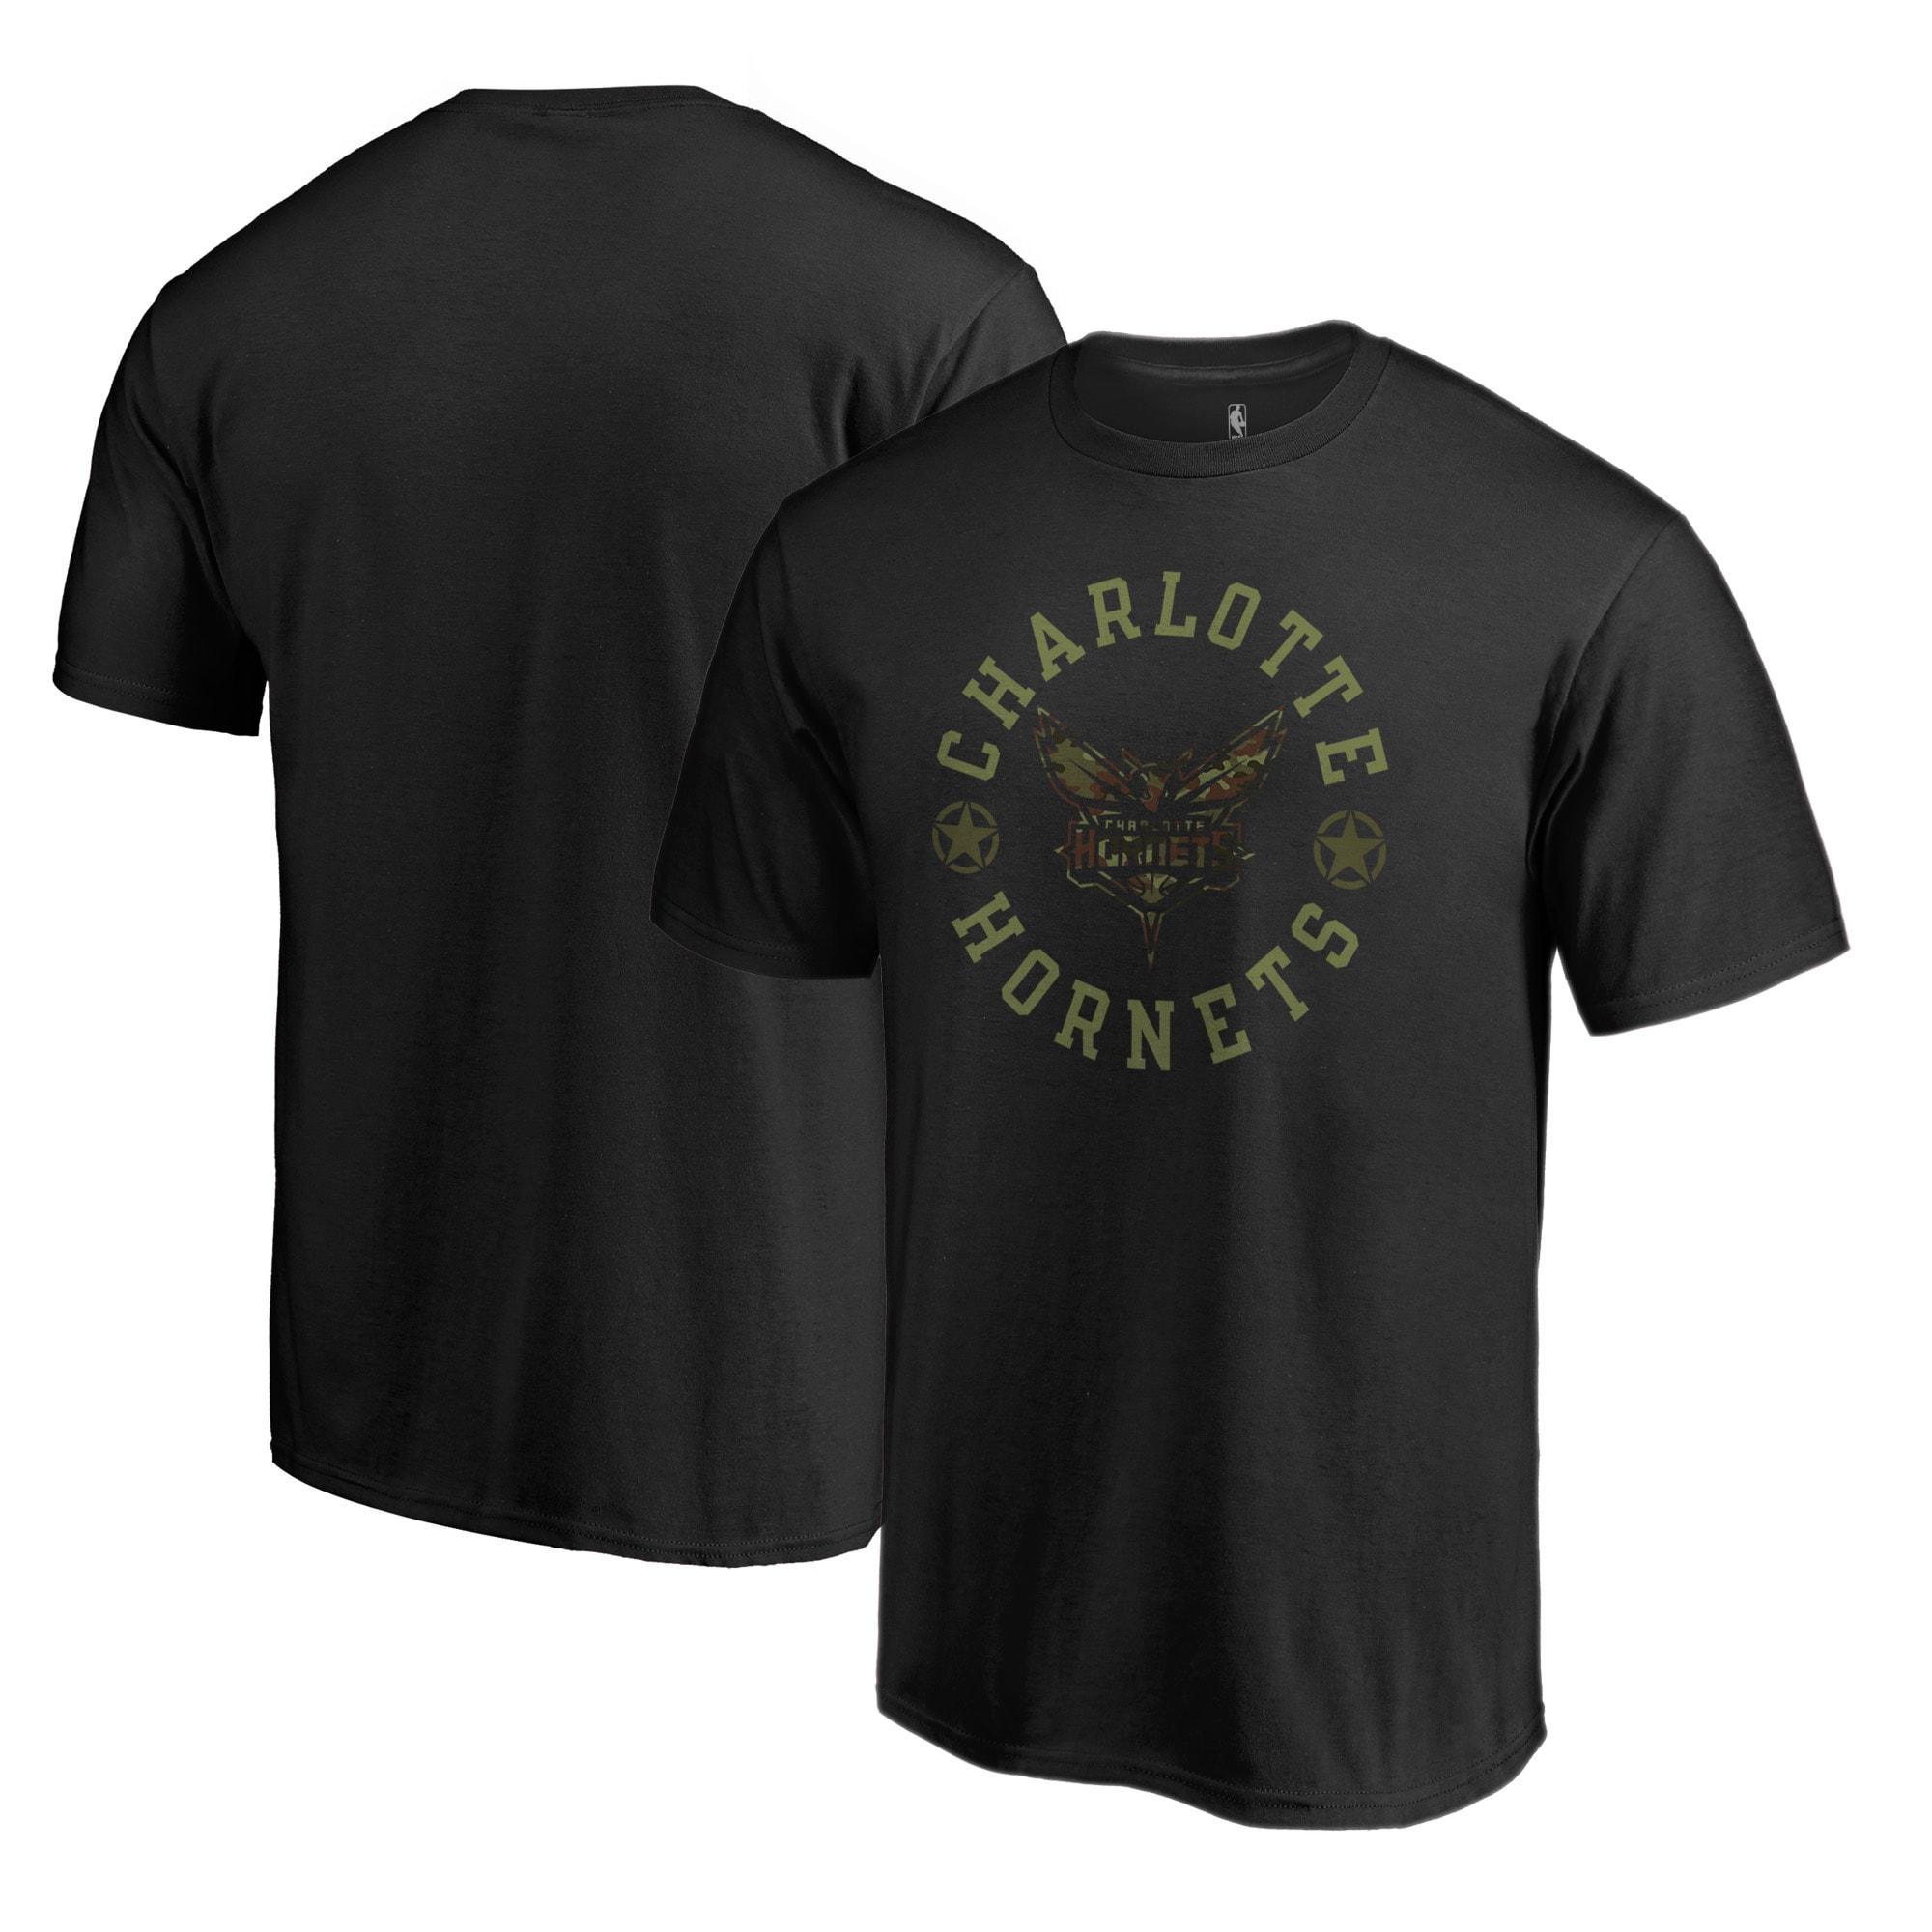 Charlotte Hornets Fanatics Branded Liberty T-Shirt - Black